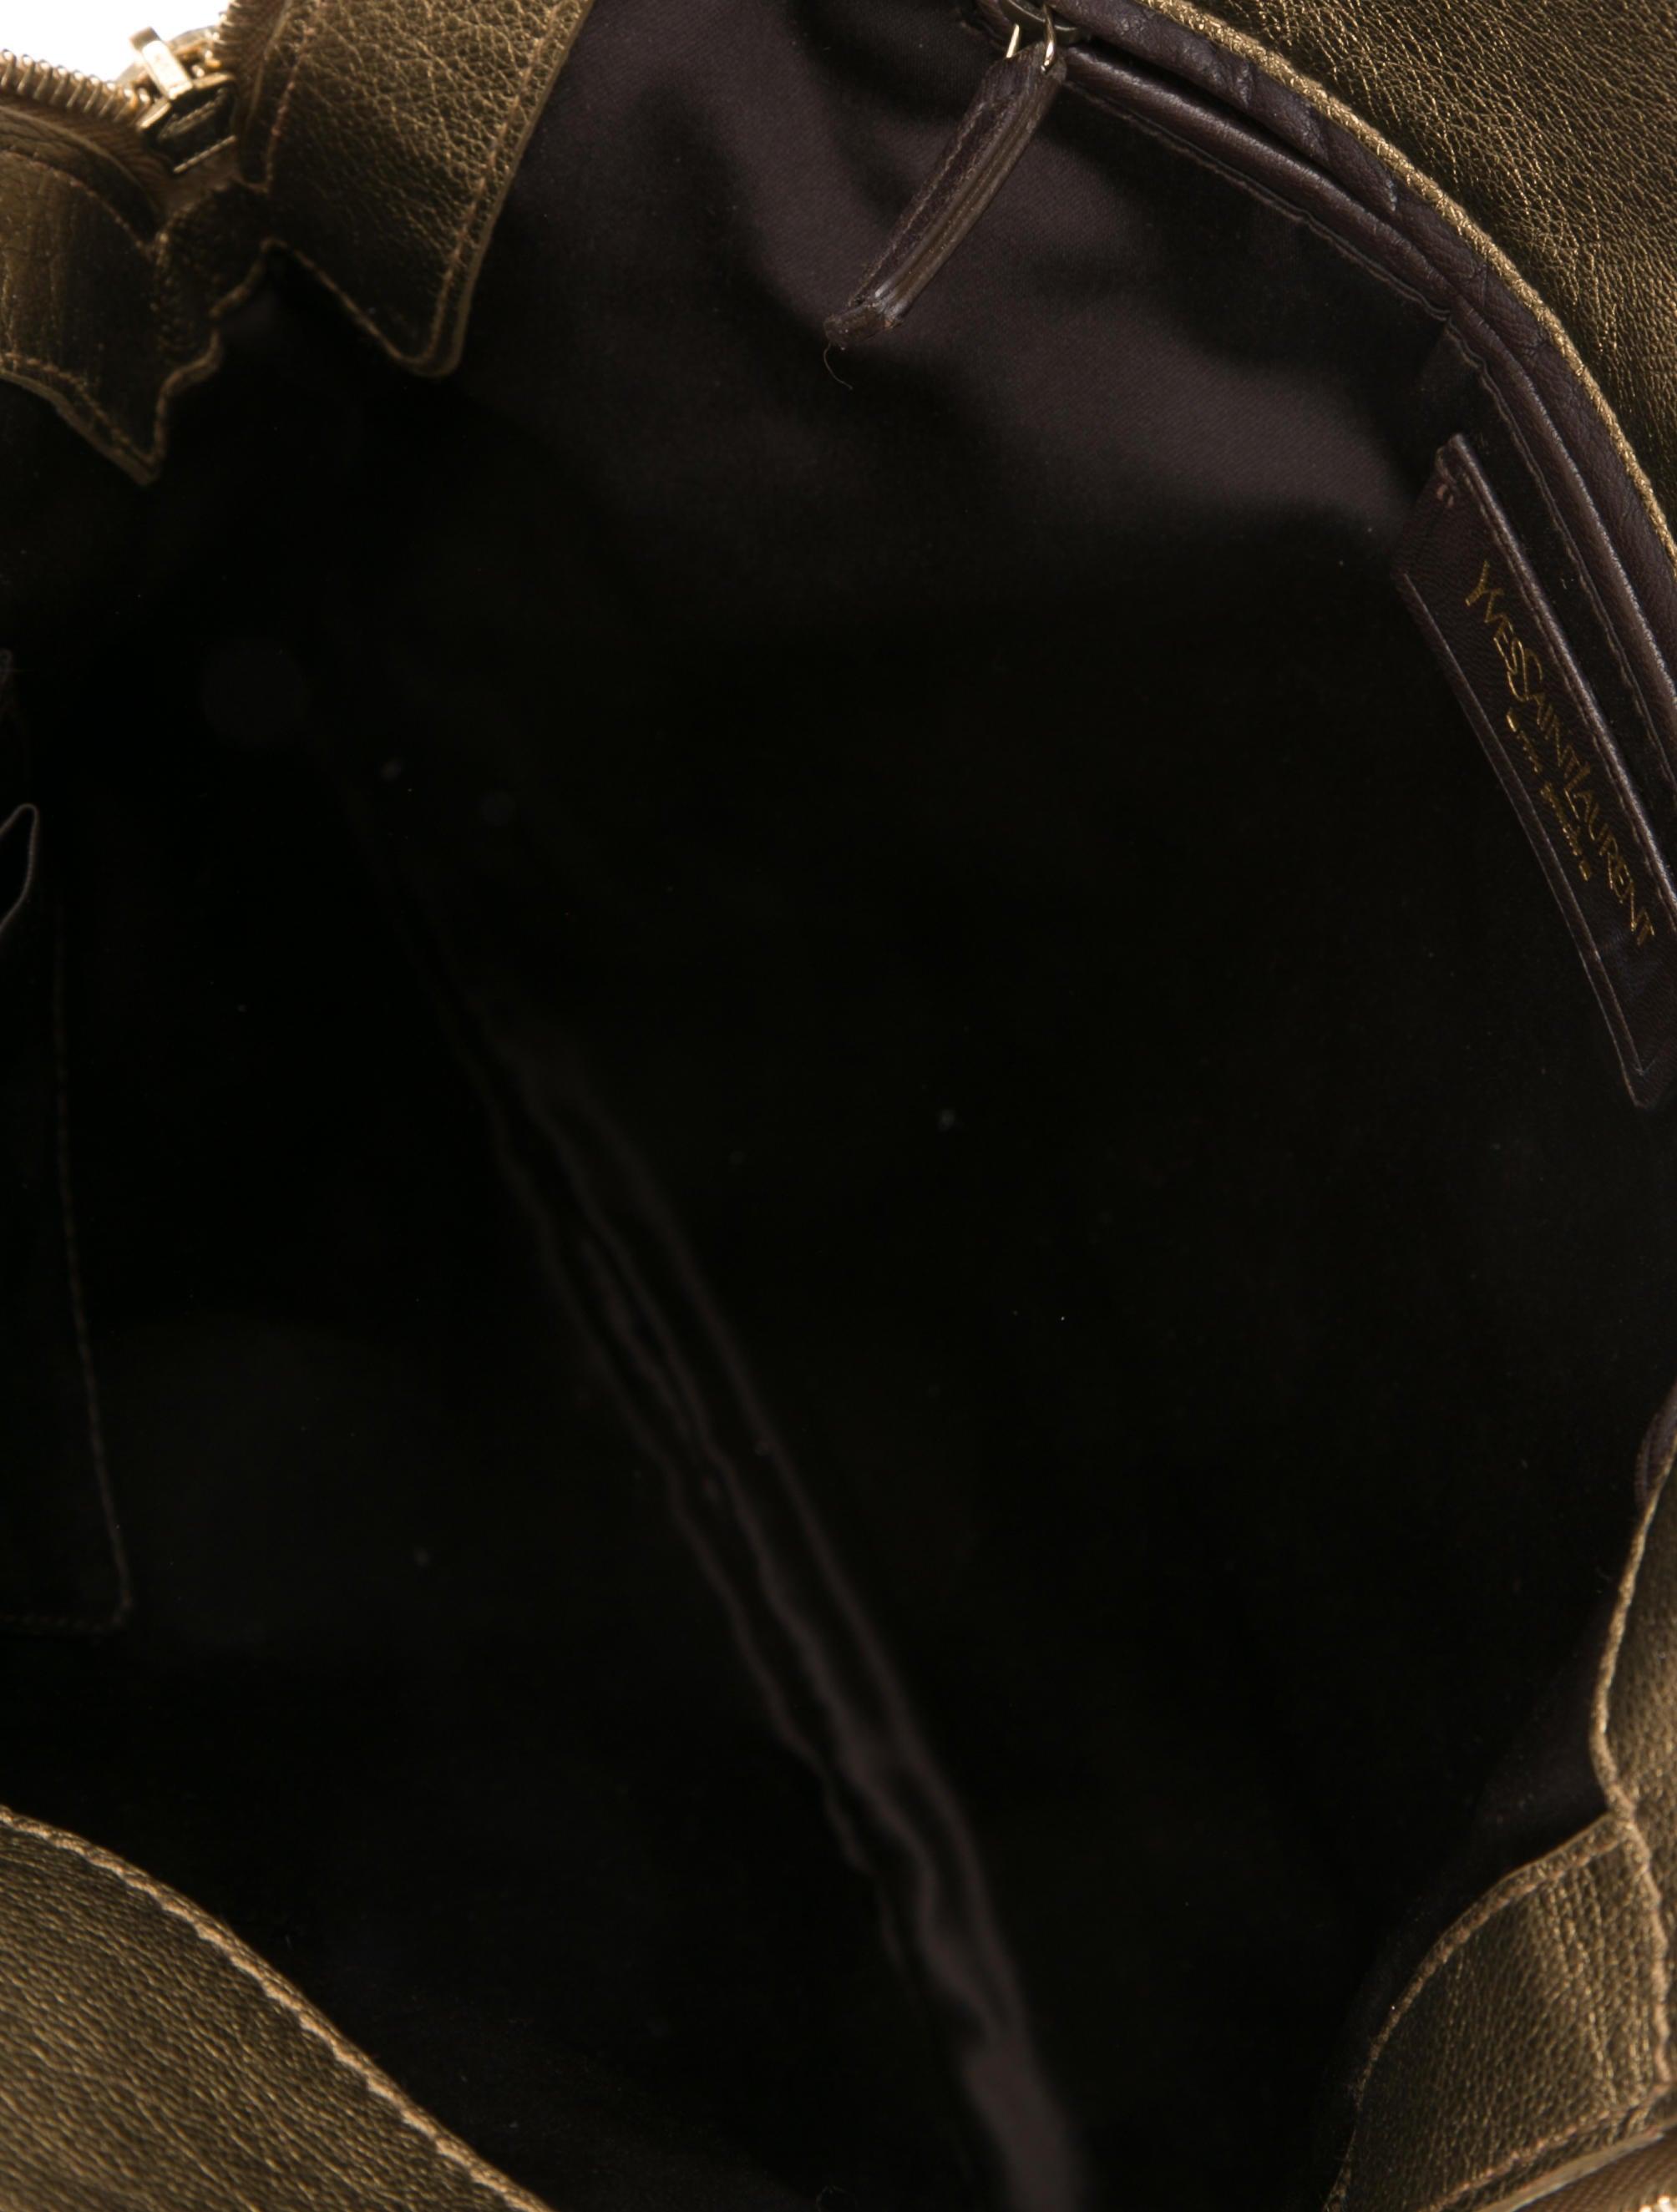 yves saint laurent cabas chyc mini leather satchel - yves saint laurent metallic mini tribute tote, yves saint laurent ...